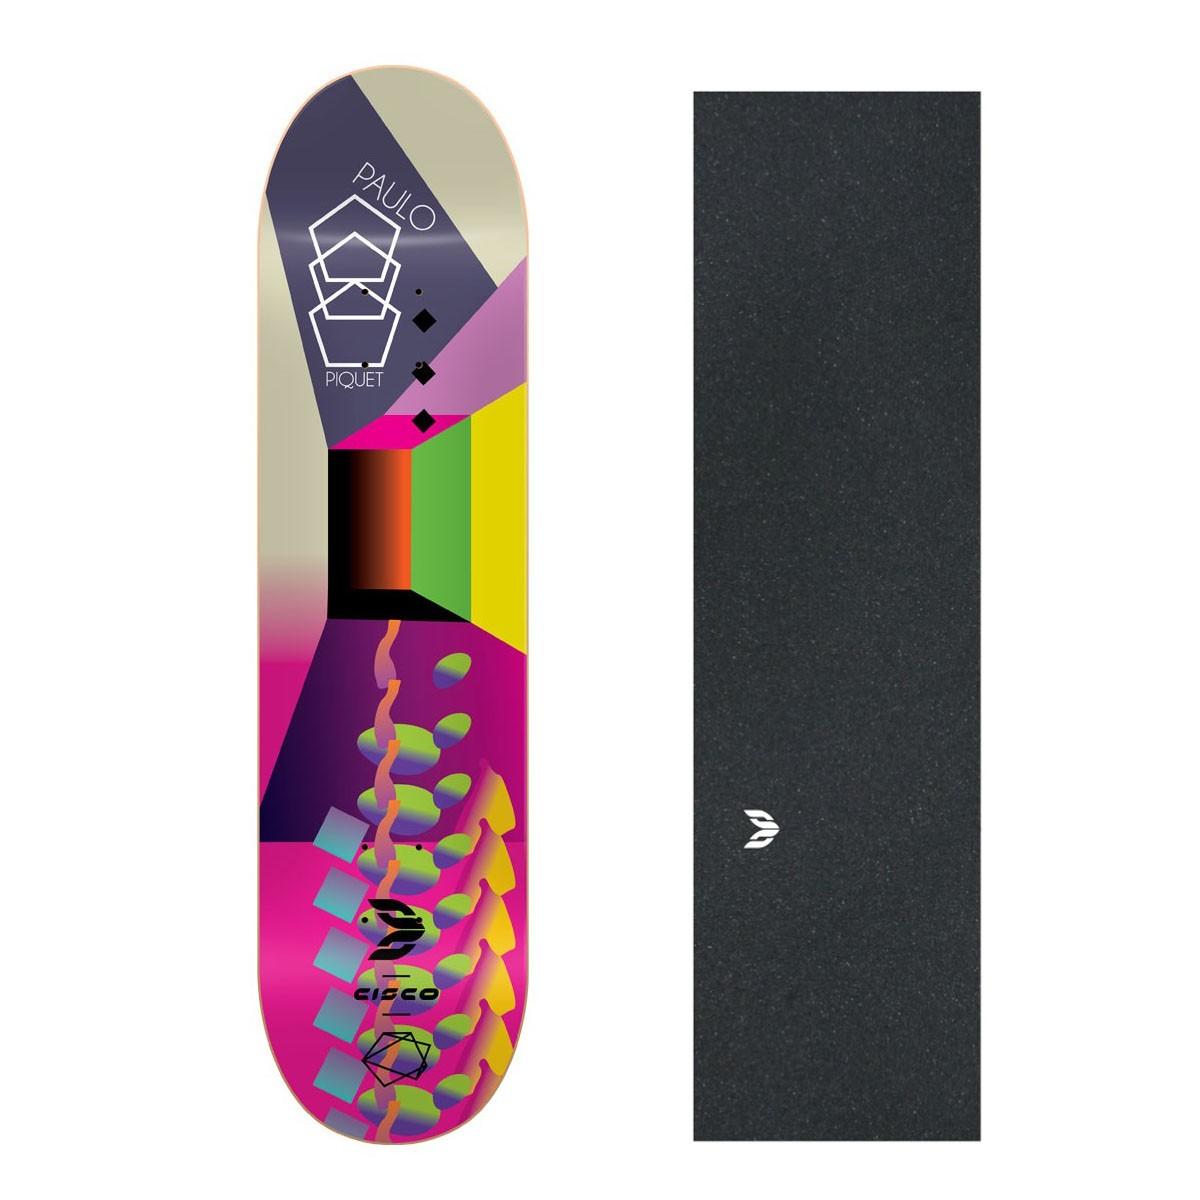 "Shape Cisco Skate Fiber Decks Neon Paulo Piquet 8.25"" + Lixa Emborrachada"